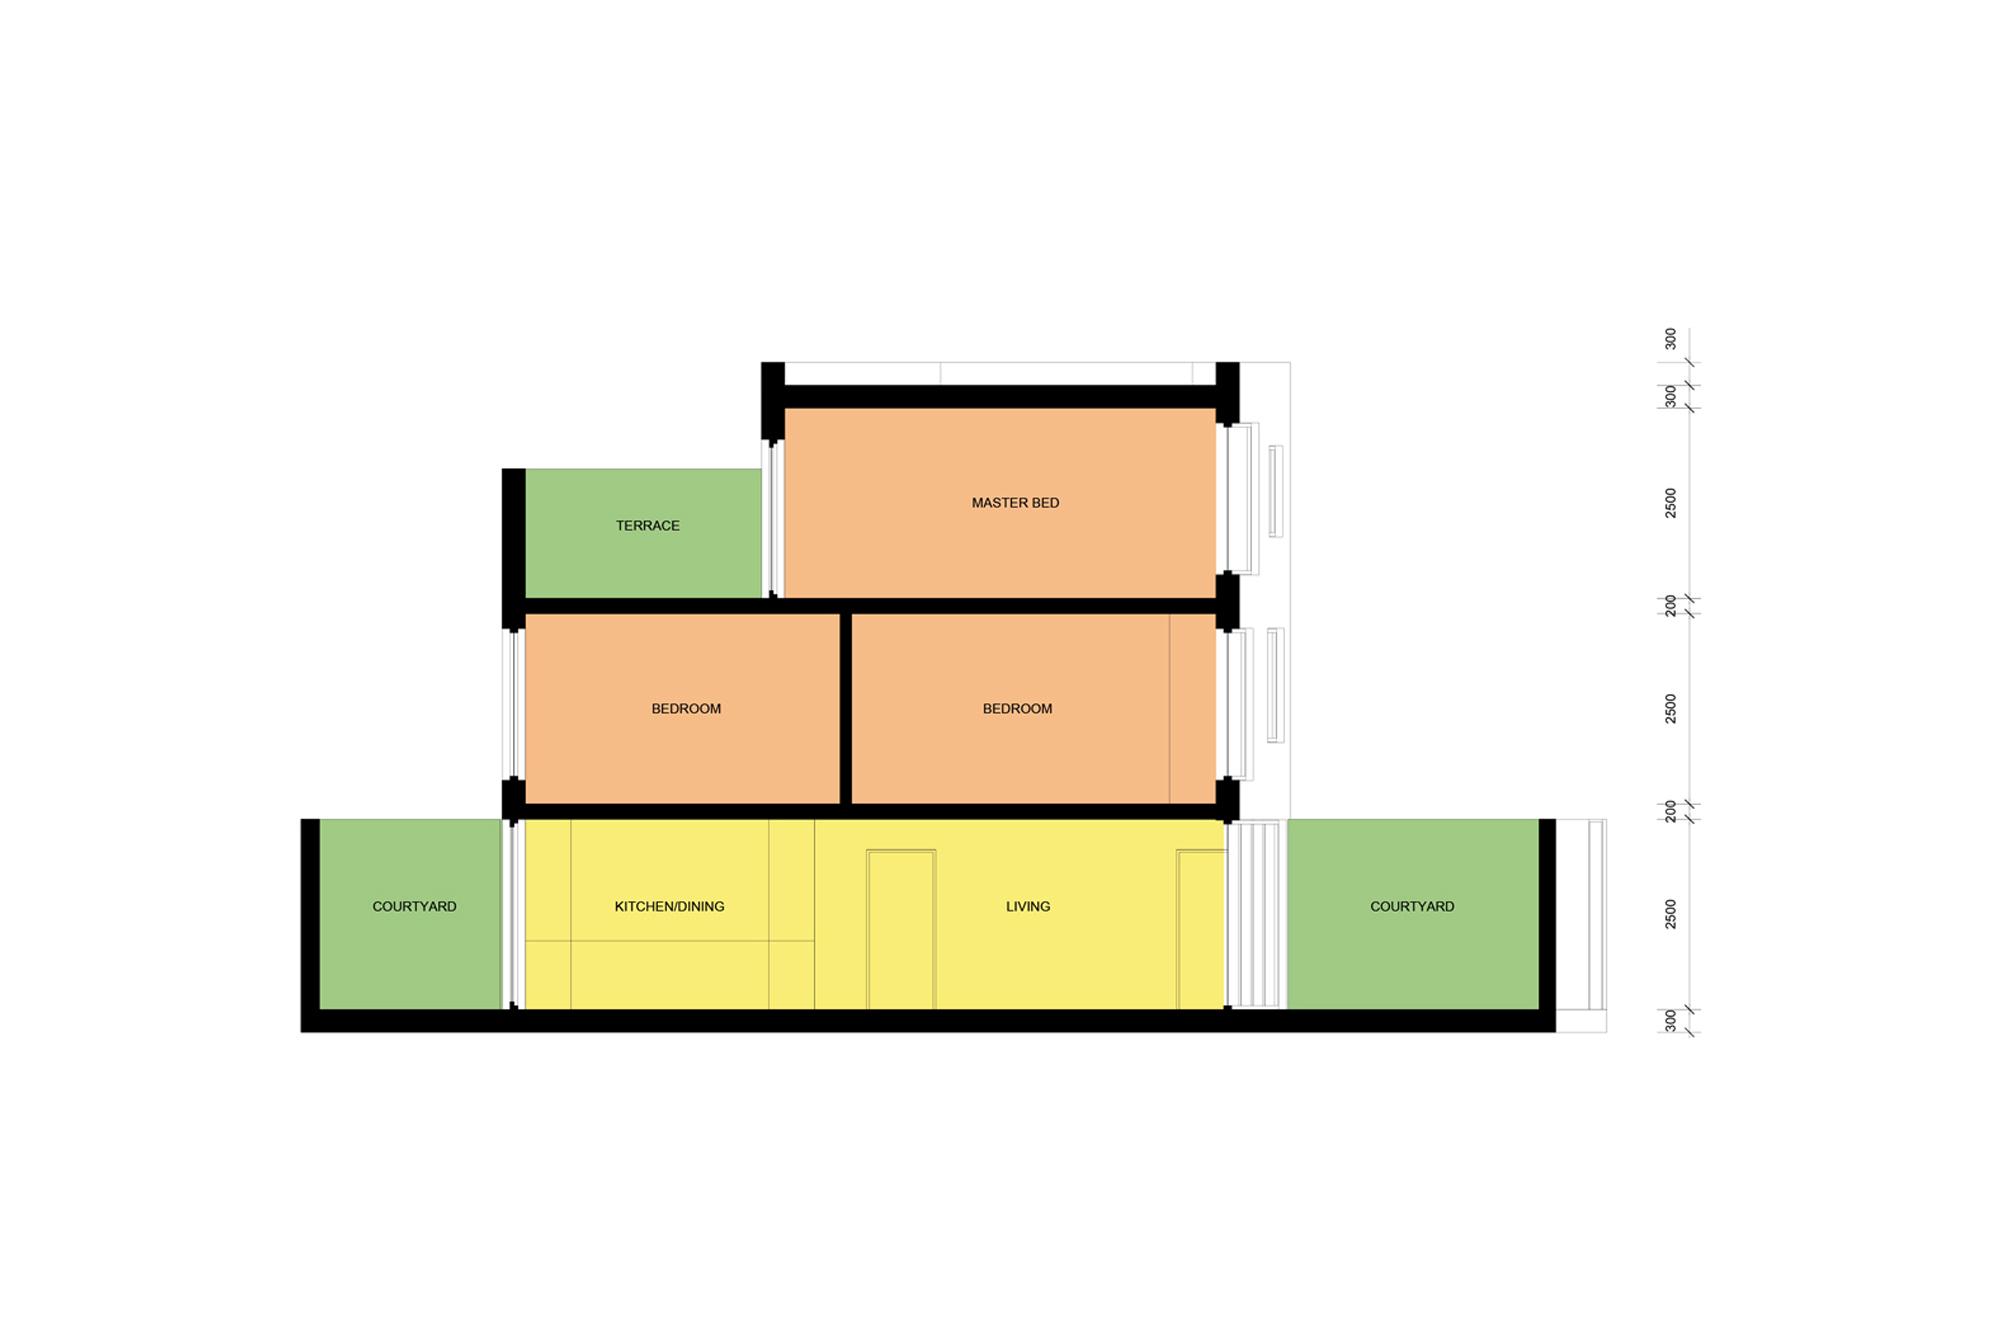 cube-haus-carl-turner-se26-cs-2000×1332-03